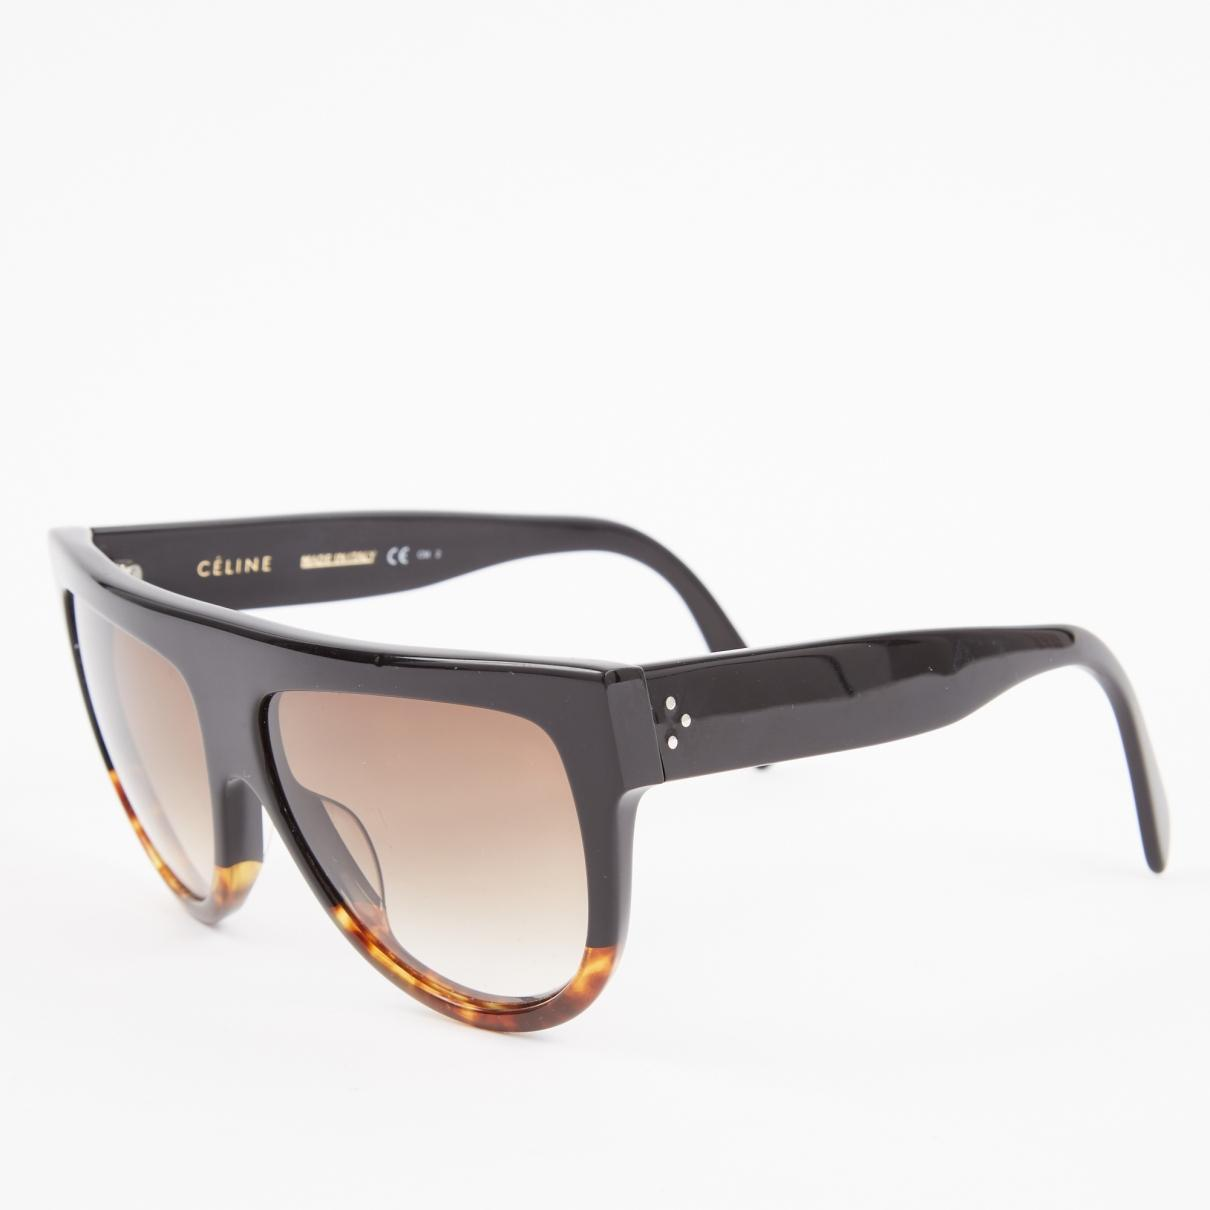 6623fc81c5a Céline - Black Plastic Sunglasses - Lyst. View fullscreen